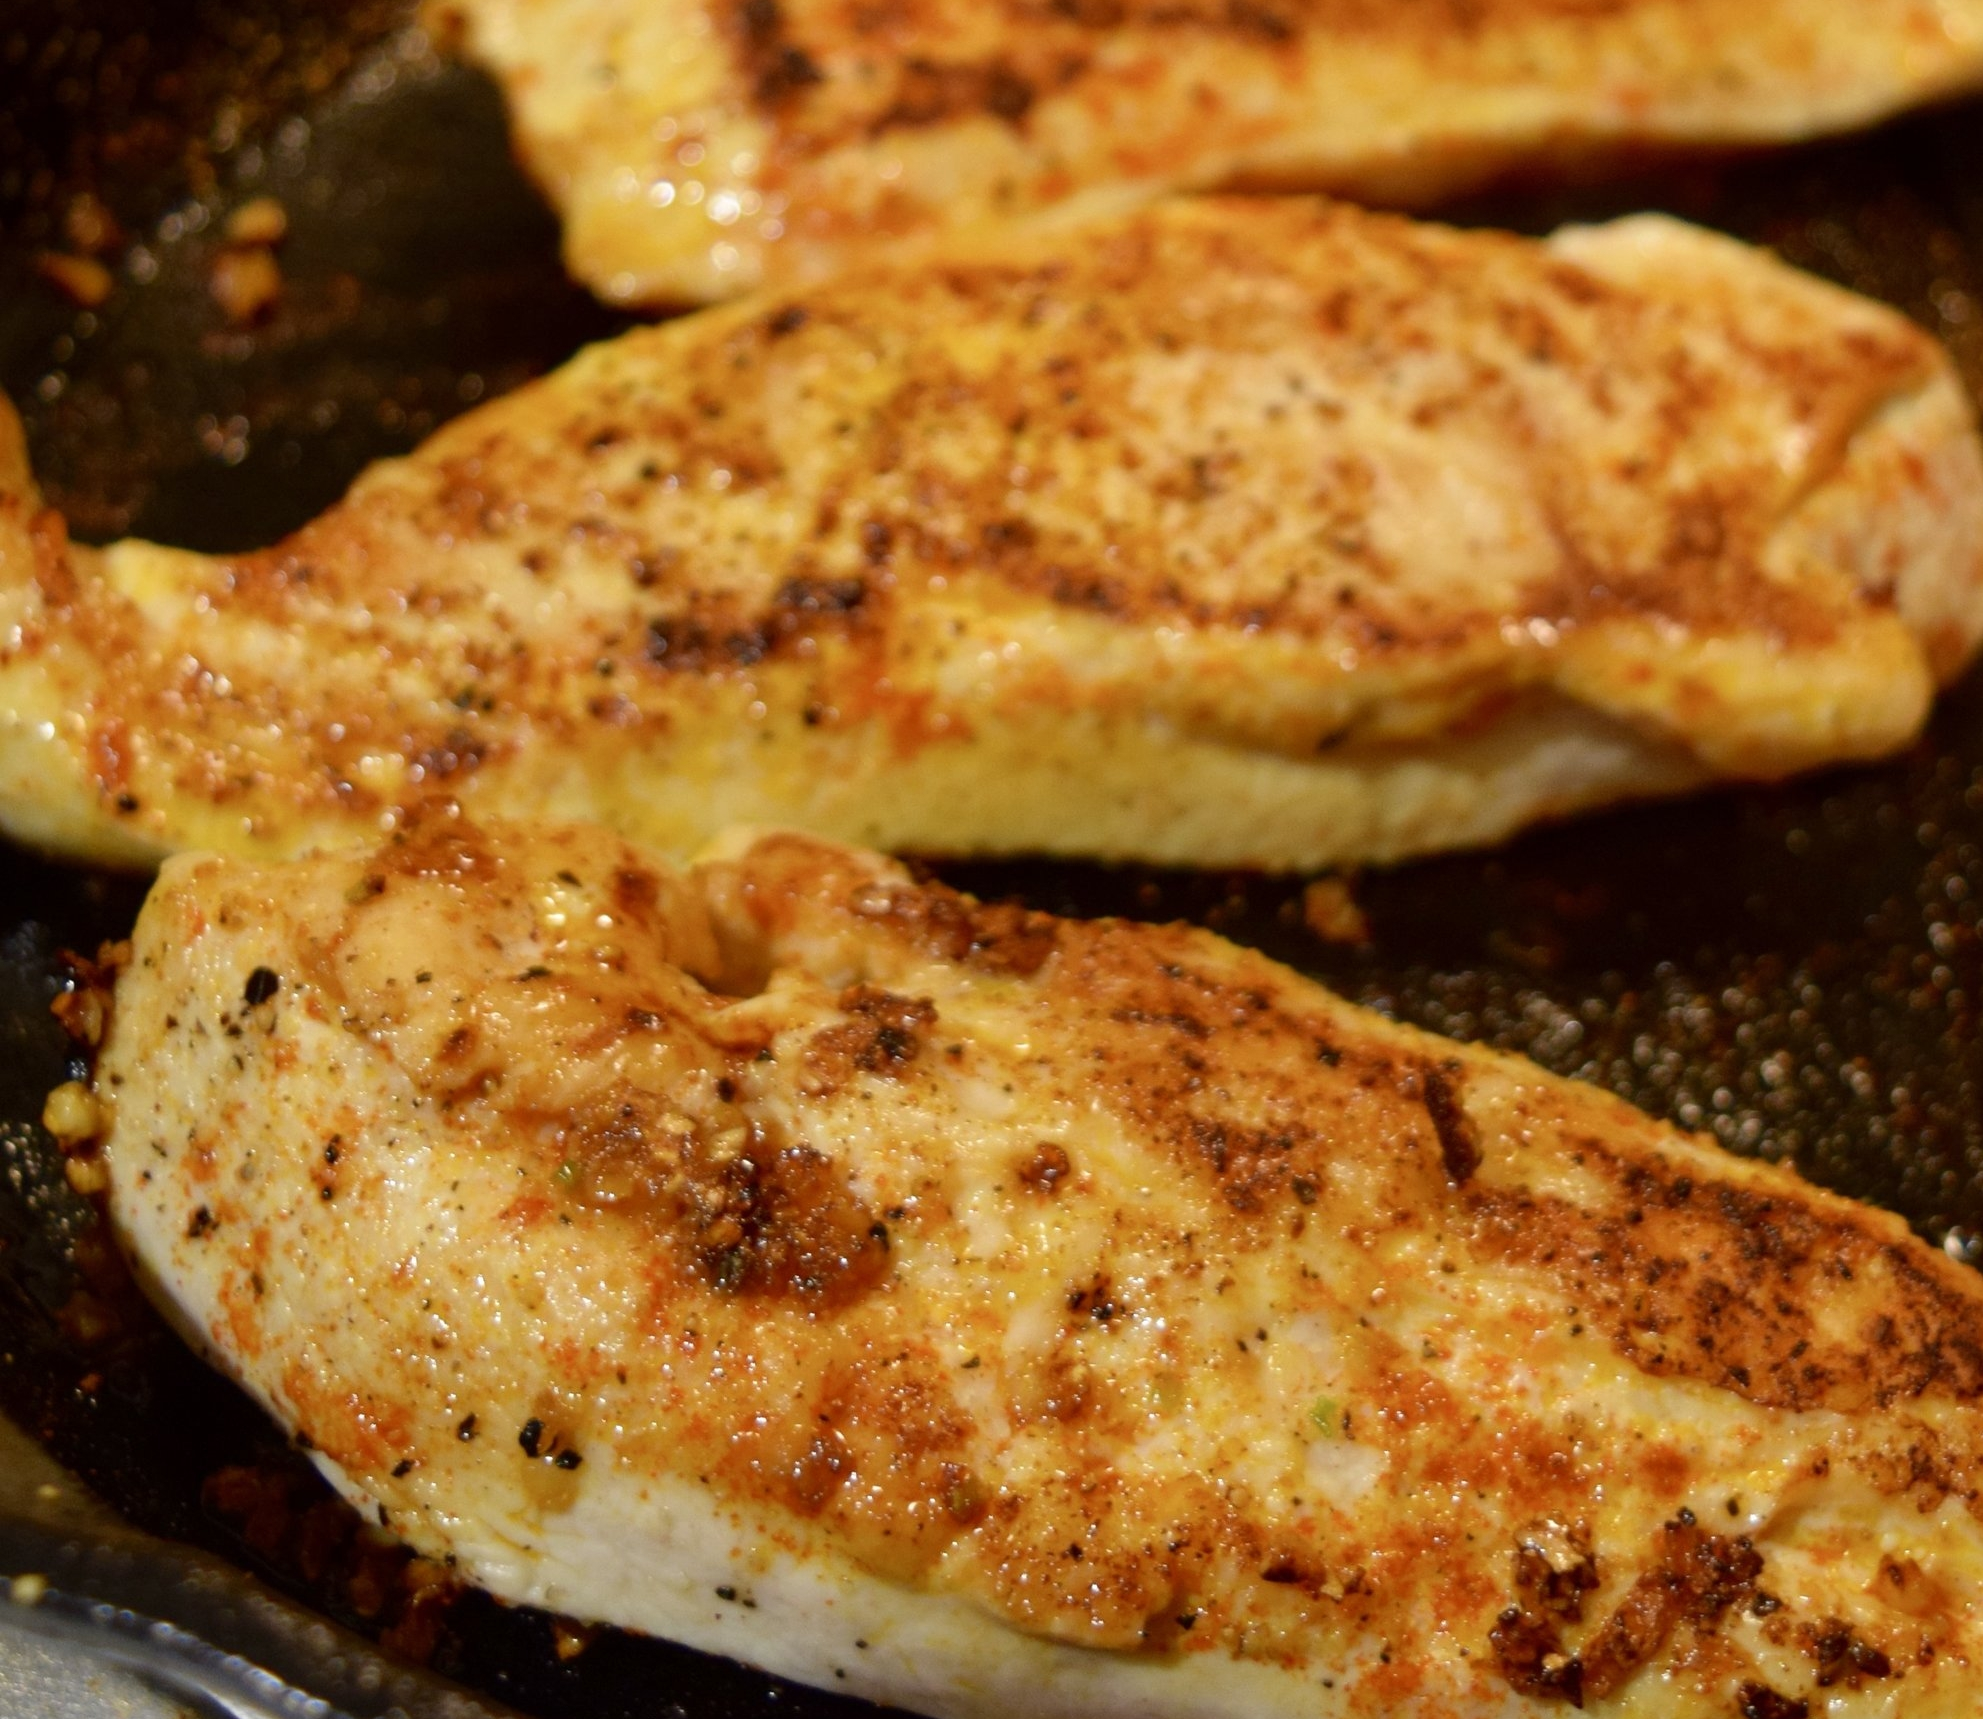 chicken_breast_seared_cast_iron_skillet.jpg